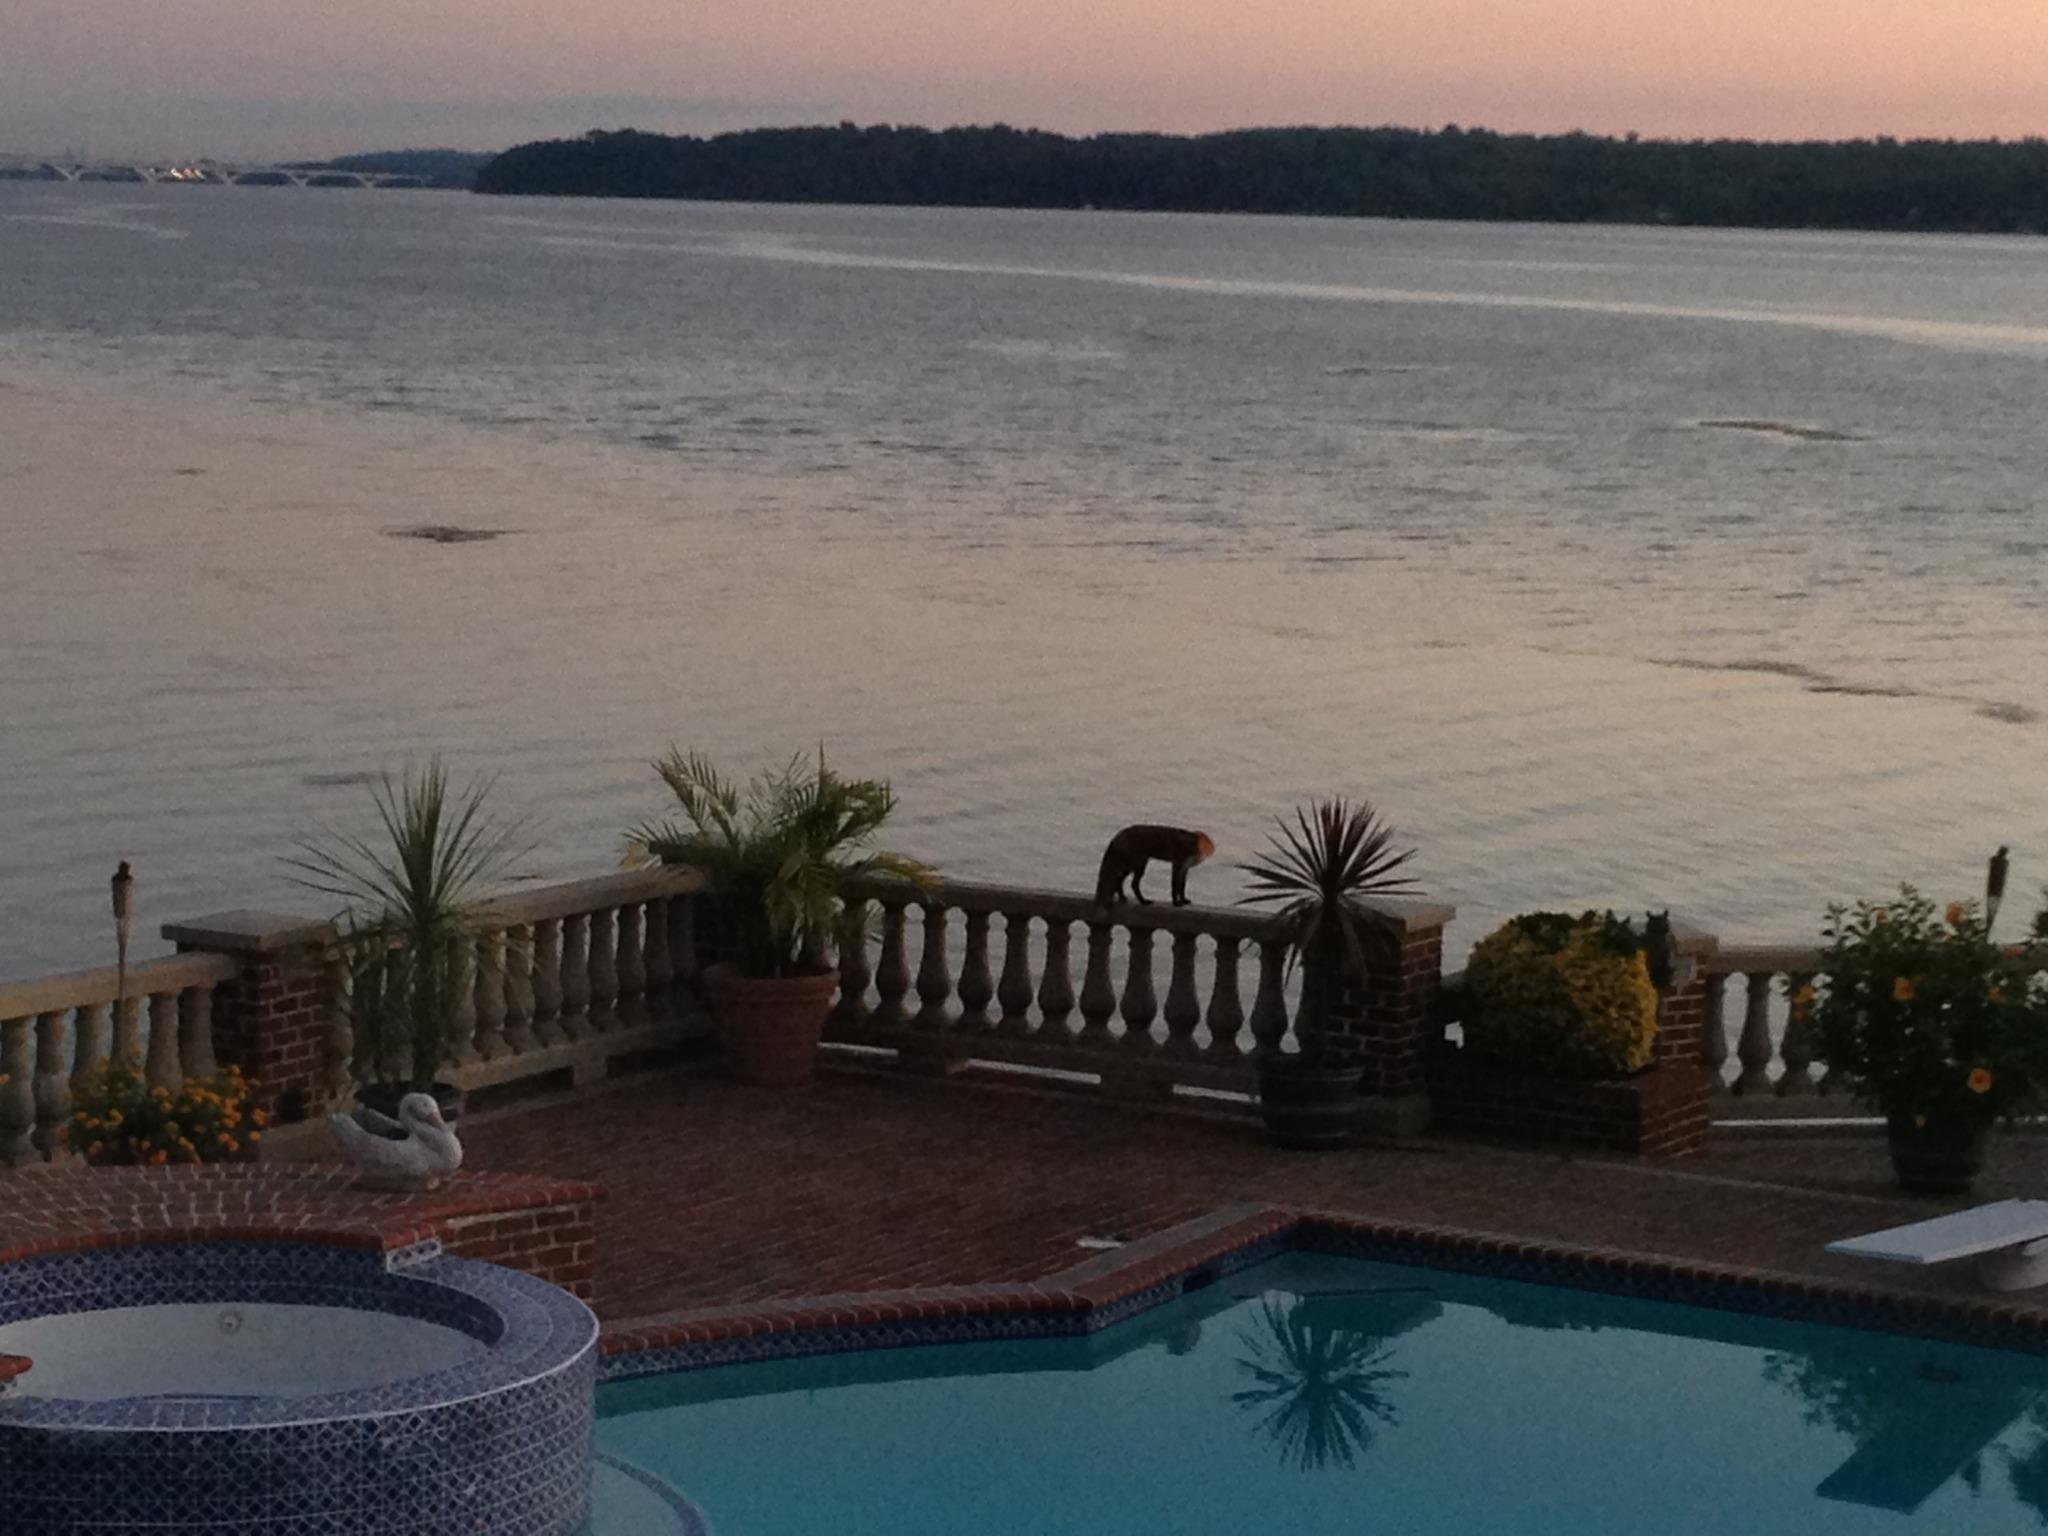 Chris Sendi - Puppy wolf by the pool